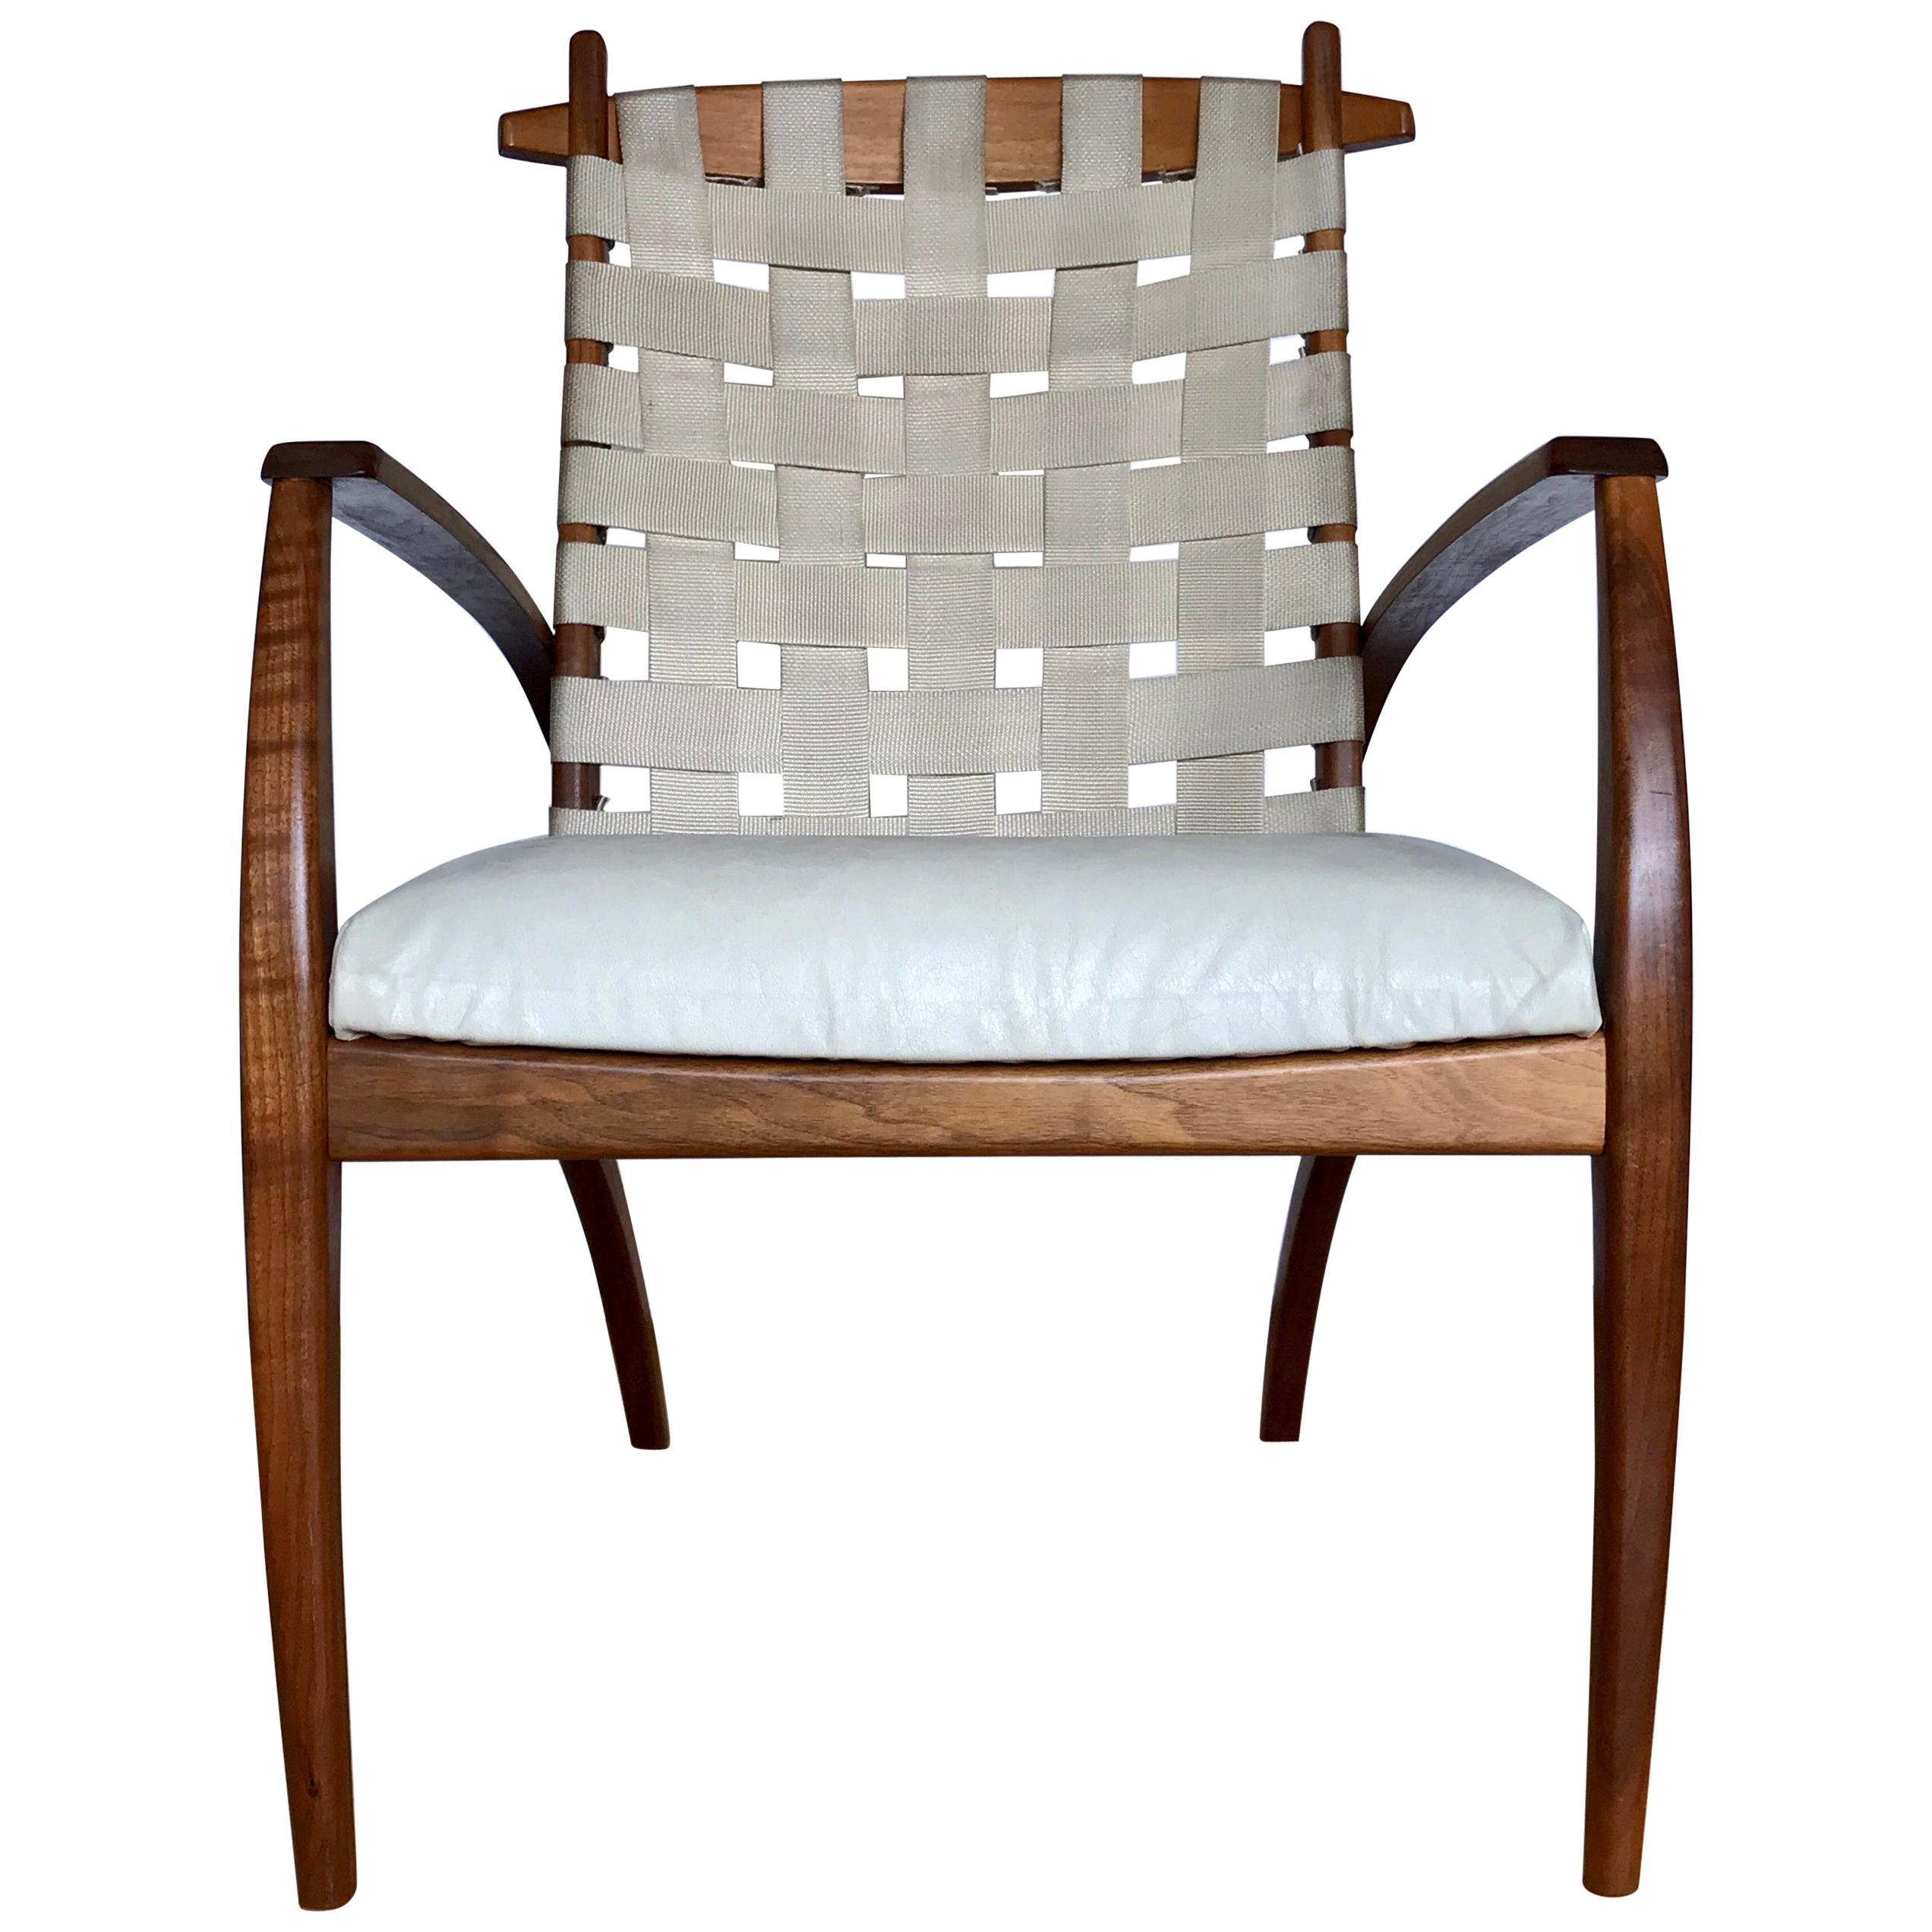 Studio Craft Design Lounge Chair